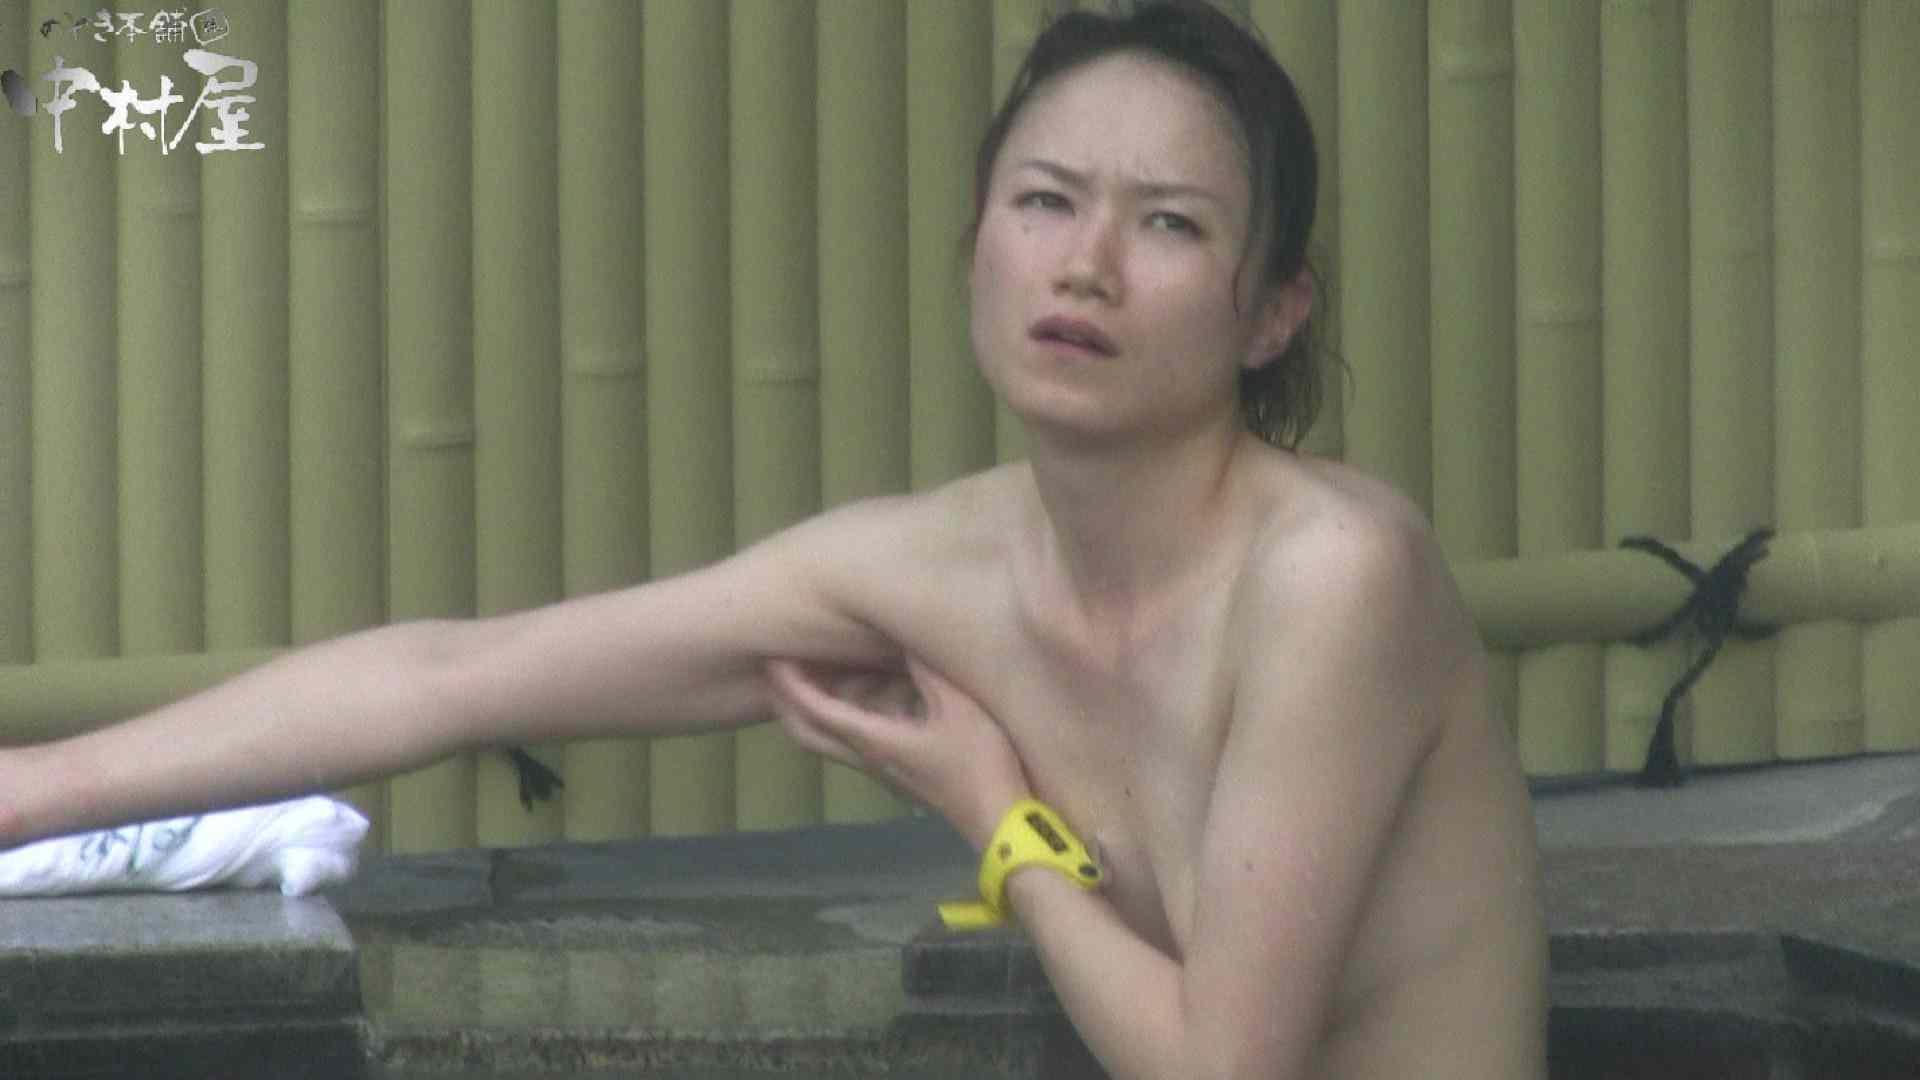 Aquaな露天風呂Vol.901 露天風呂編  110PIX 86